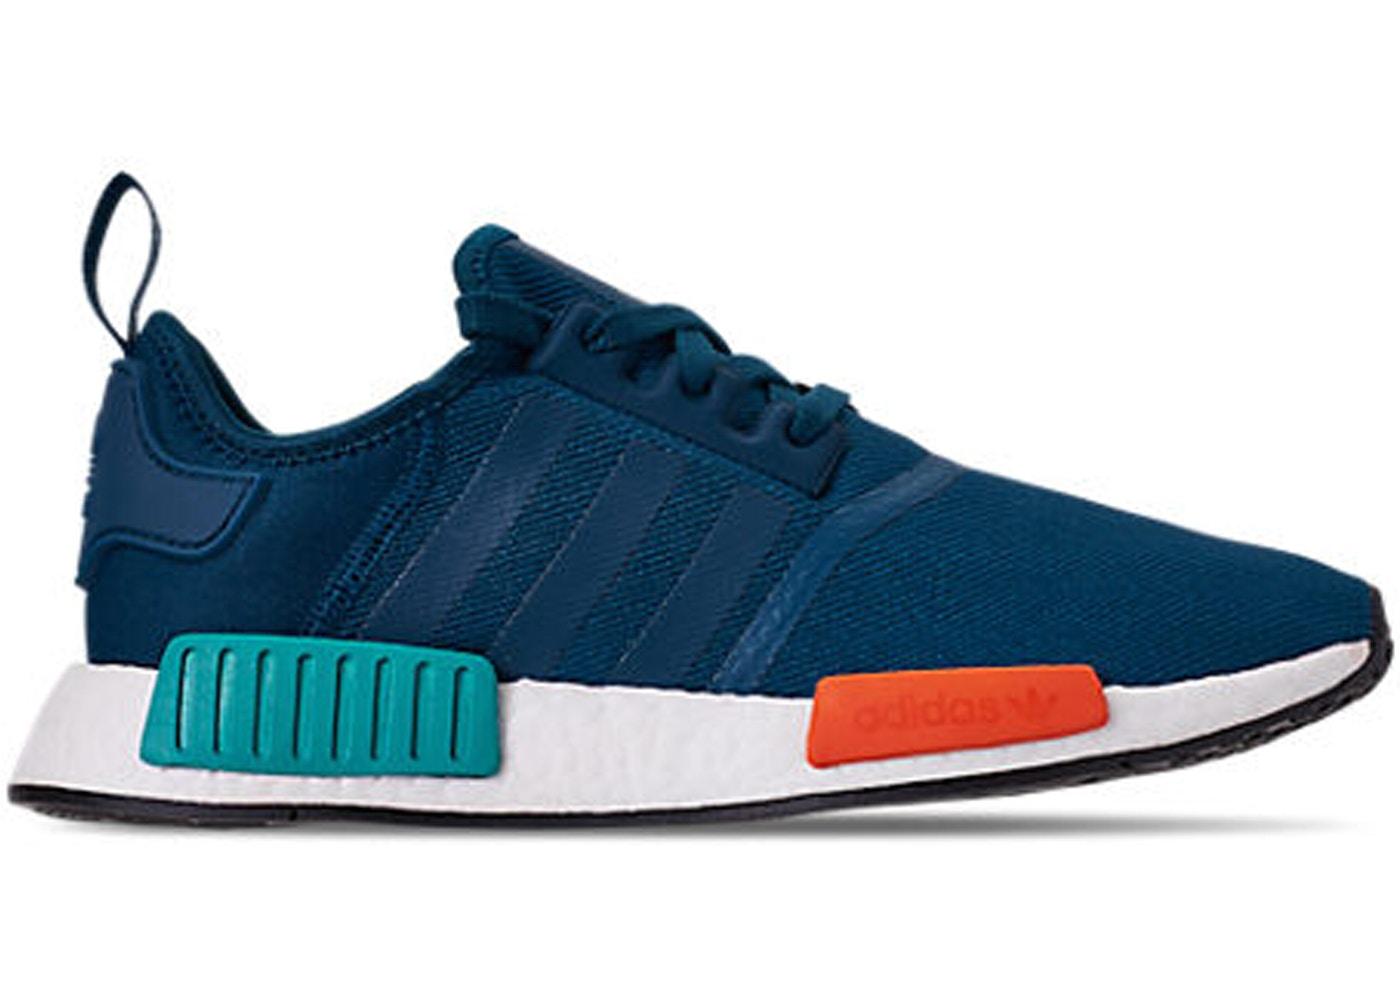 adidas nmd r1 v2 white orange blue